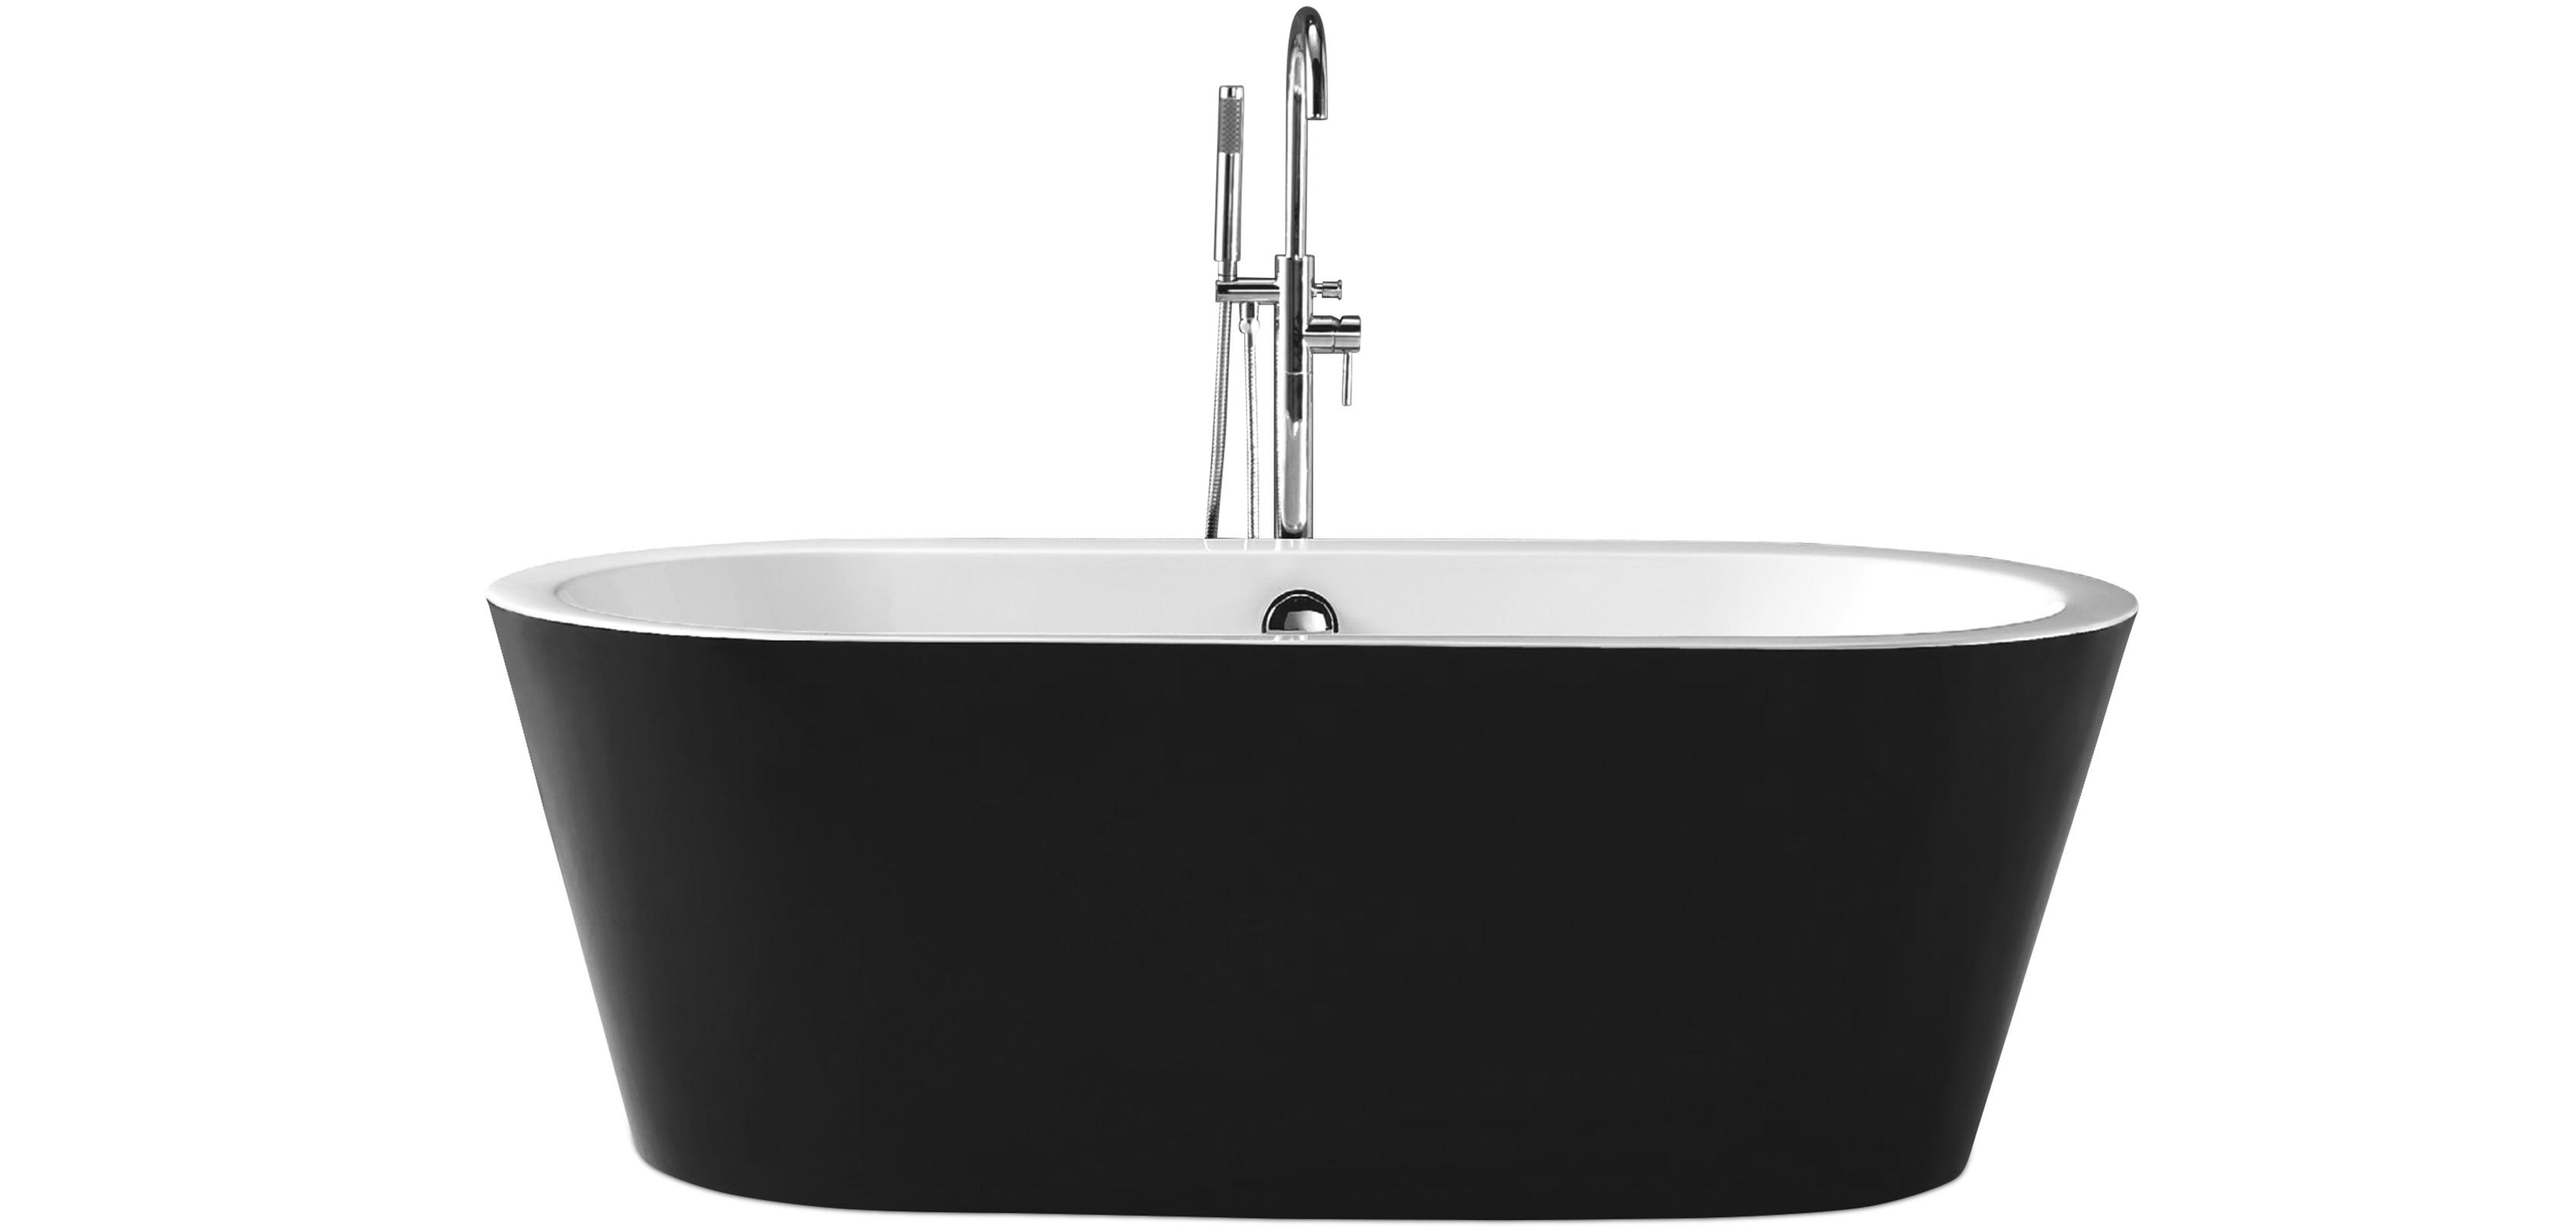 baignoire d angle noire baignoire balneo duangle. Black Bedroom Furniture Sets. Home Design Ideas